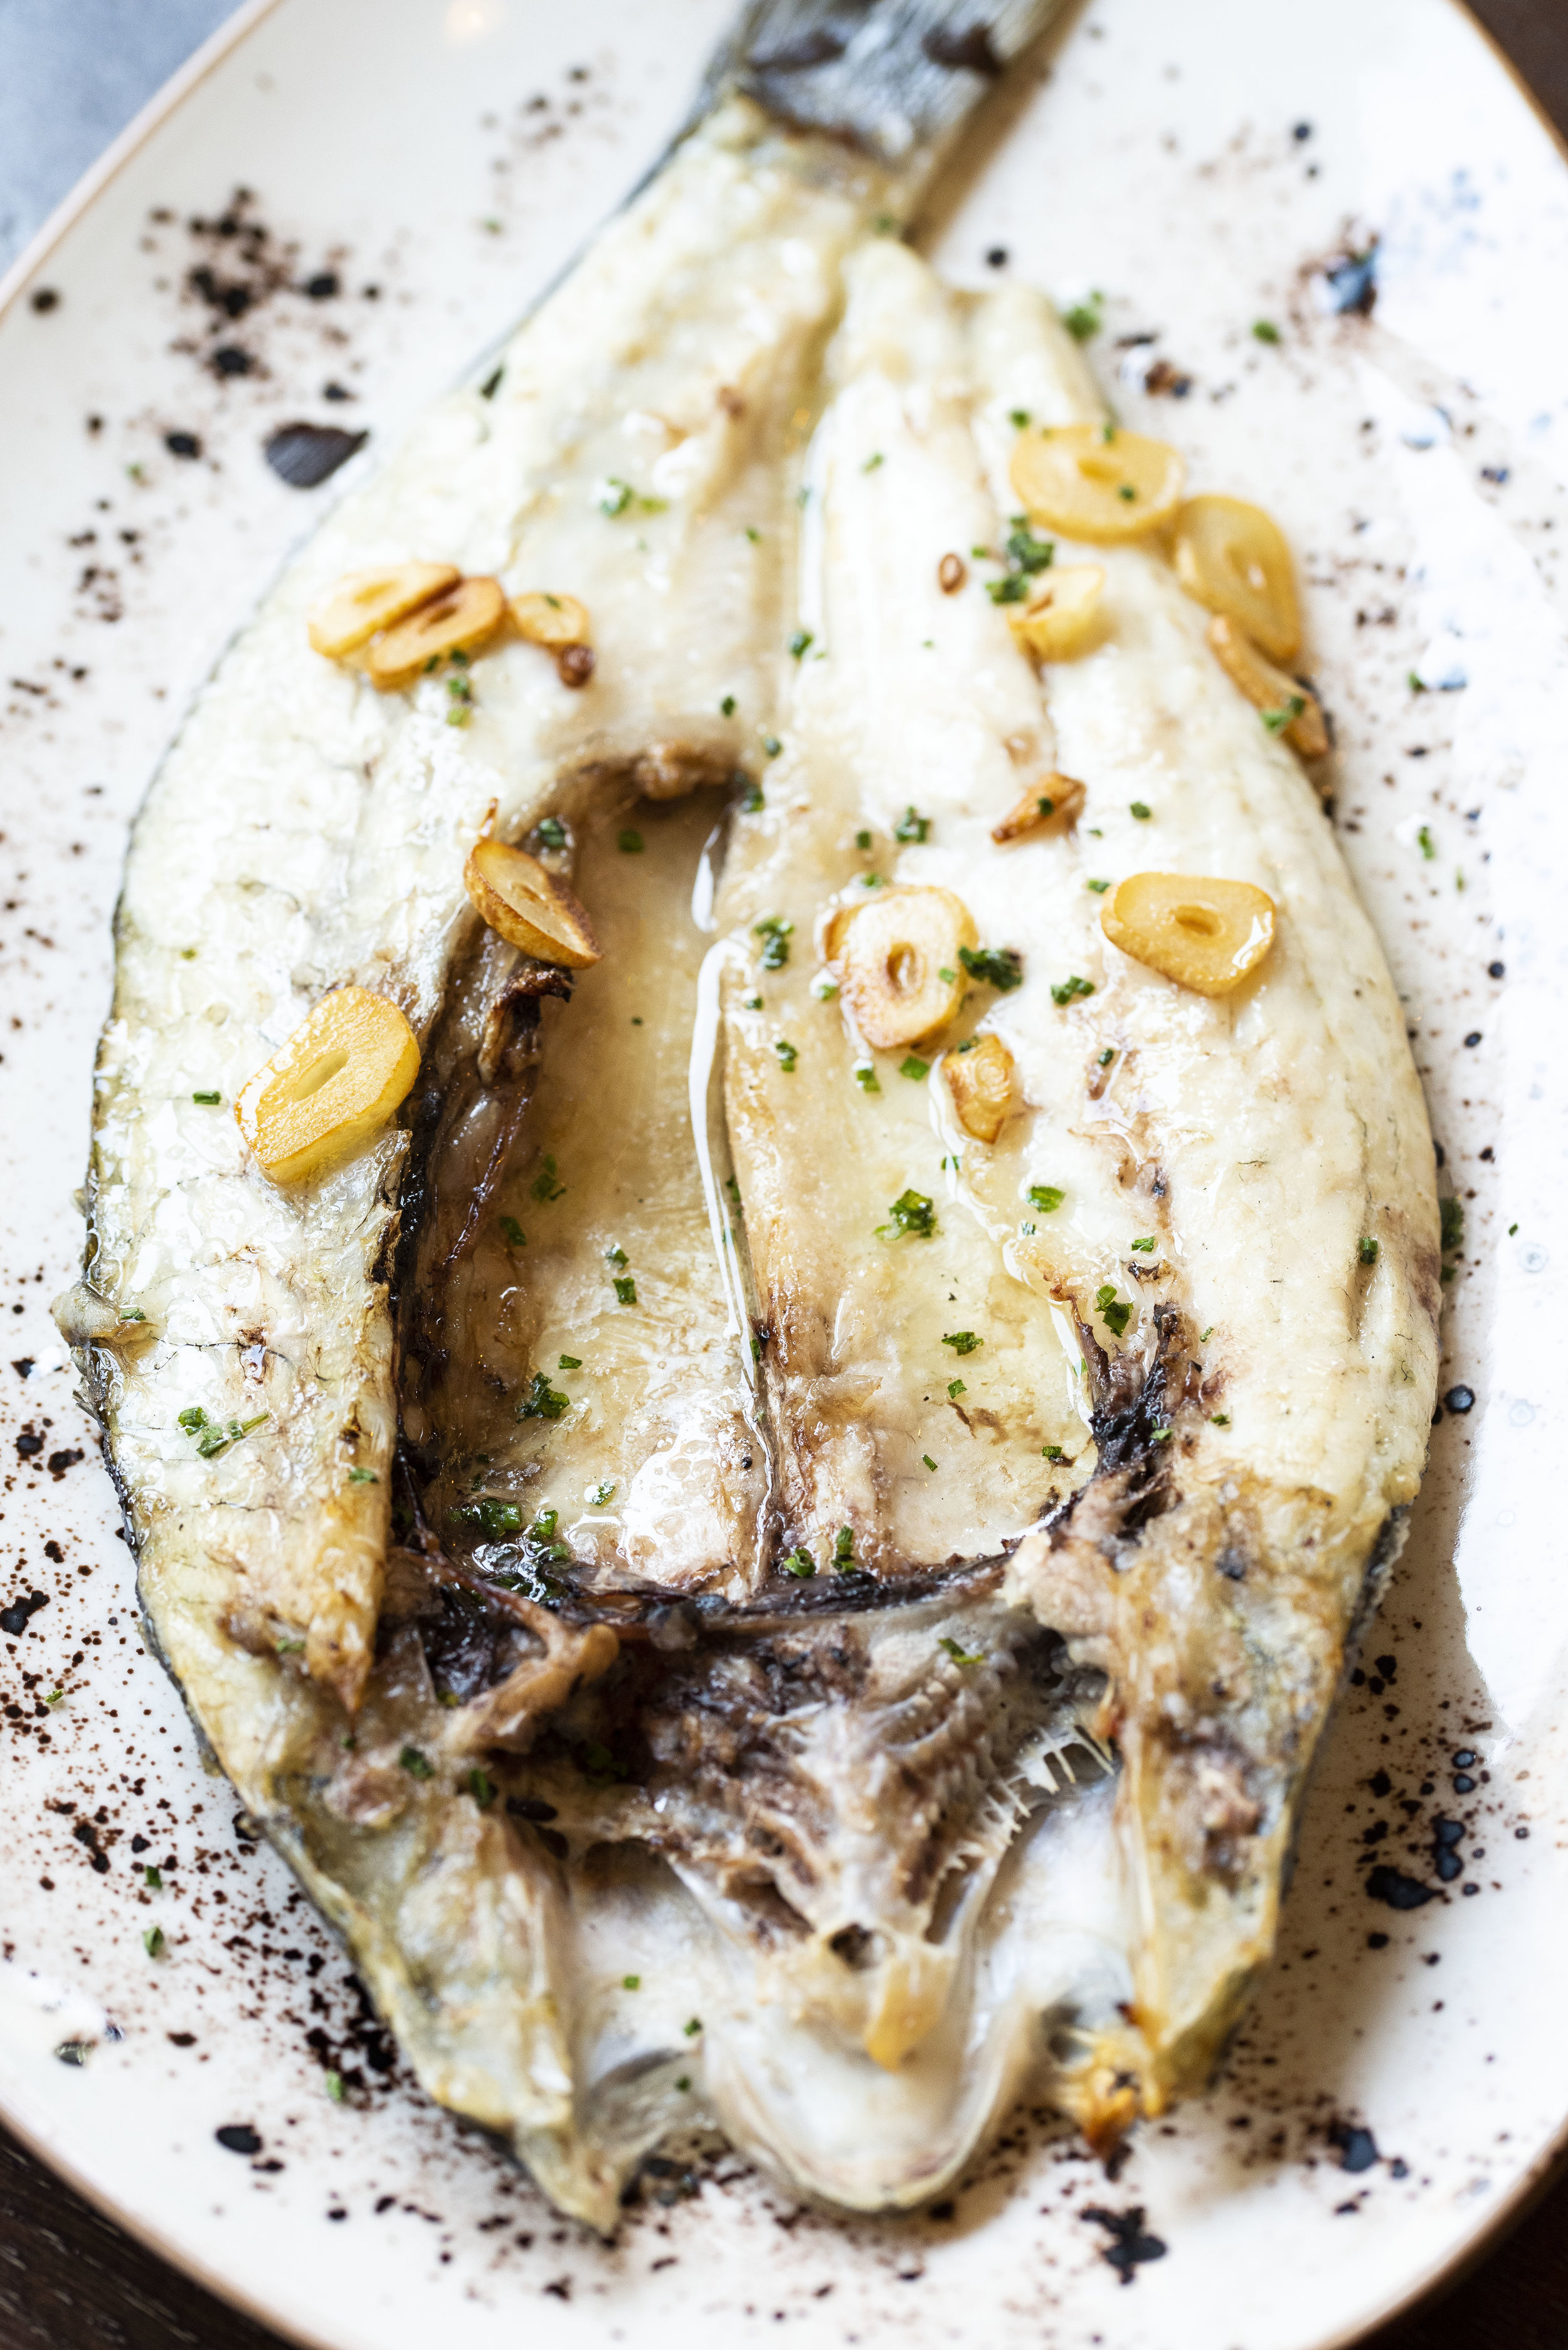 Grilled sea bass at Calabrasa, Barcelona. Photo © Barcelona Food Experience.